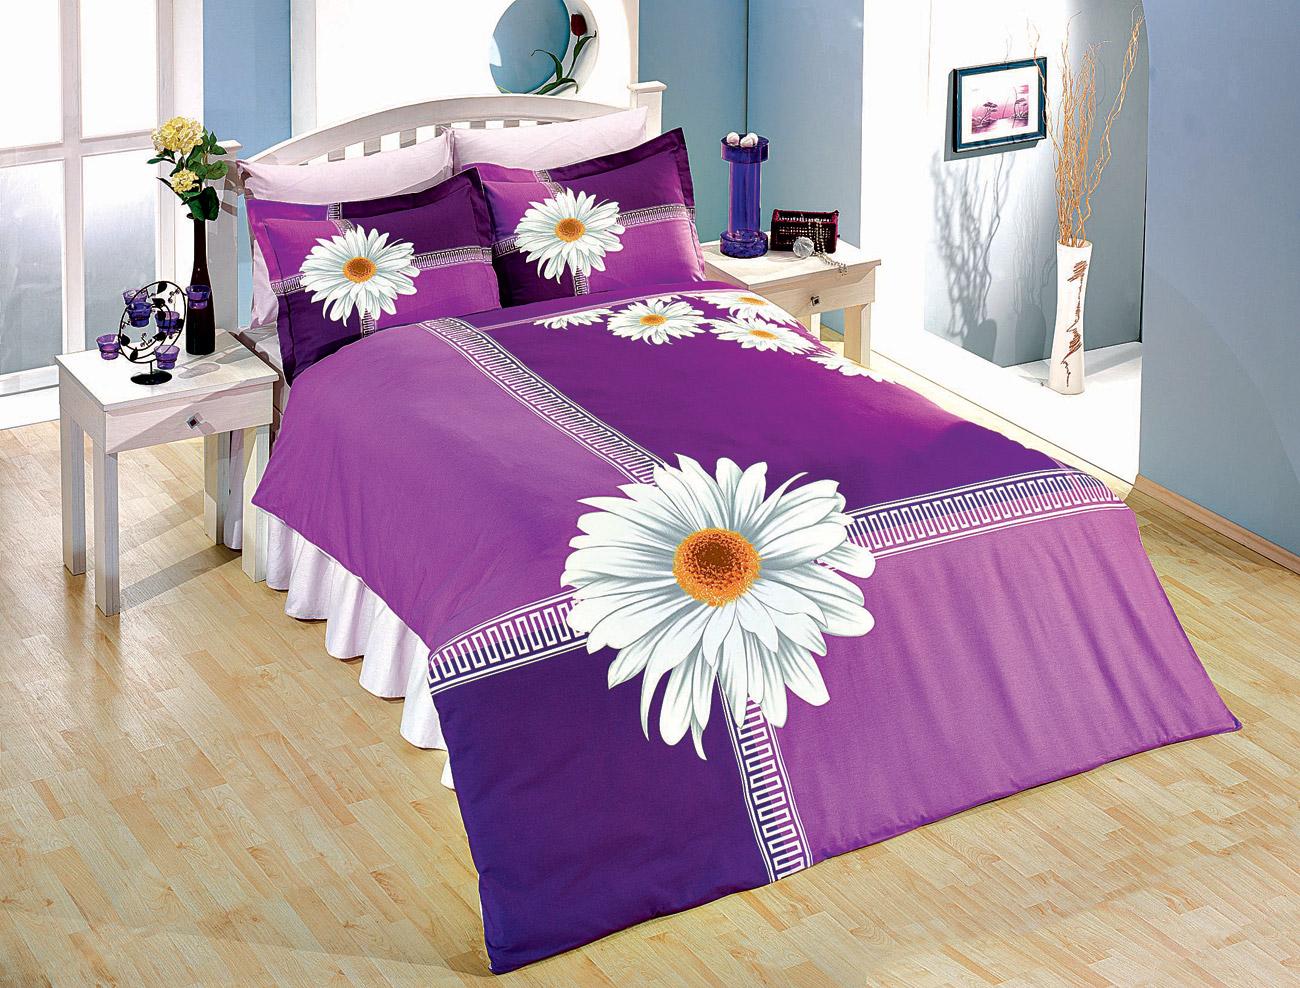 bettw sche baumwolle lila my blog. Black Bedroom Furniture Sets. Home Design Ideas